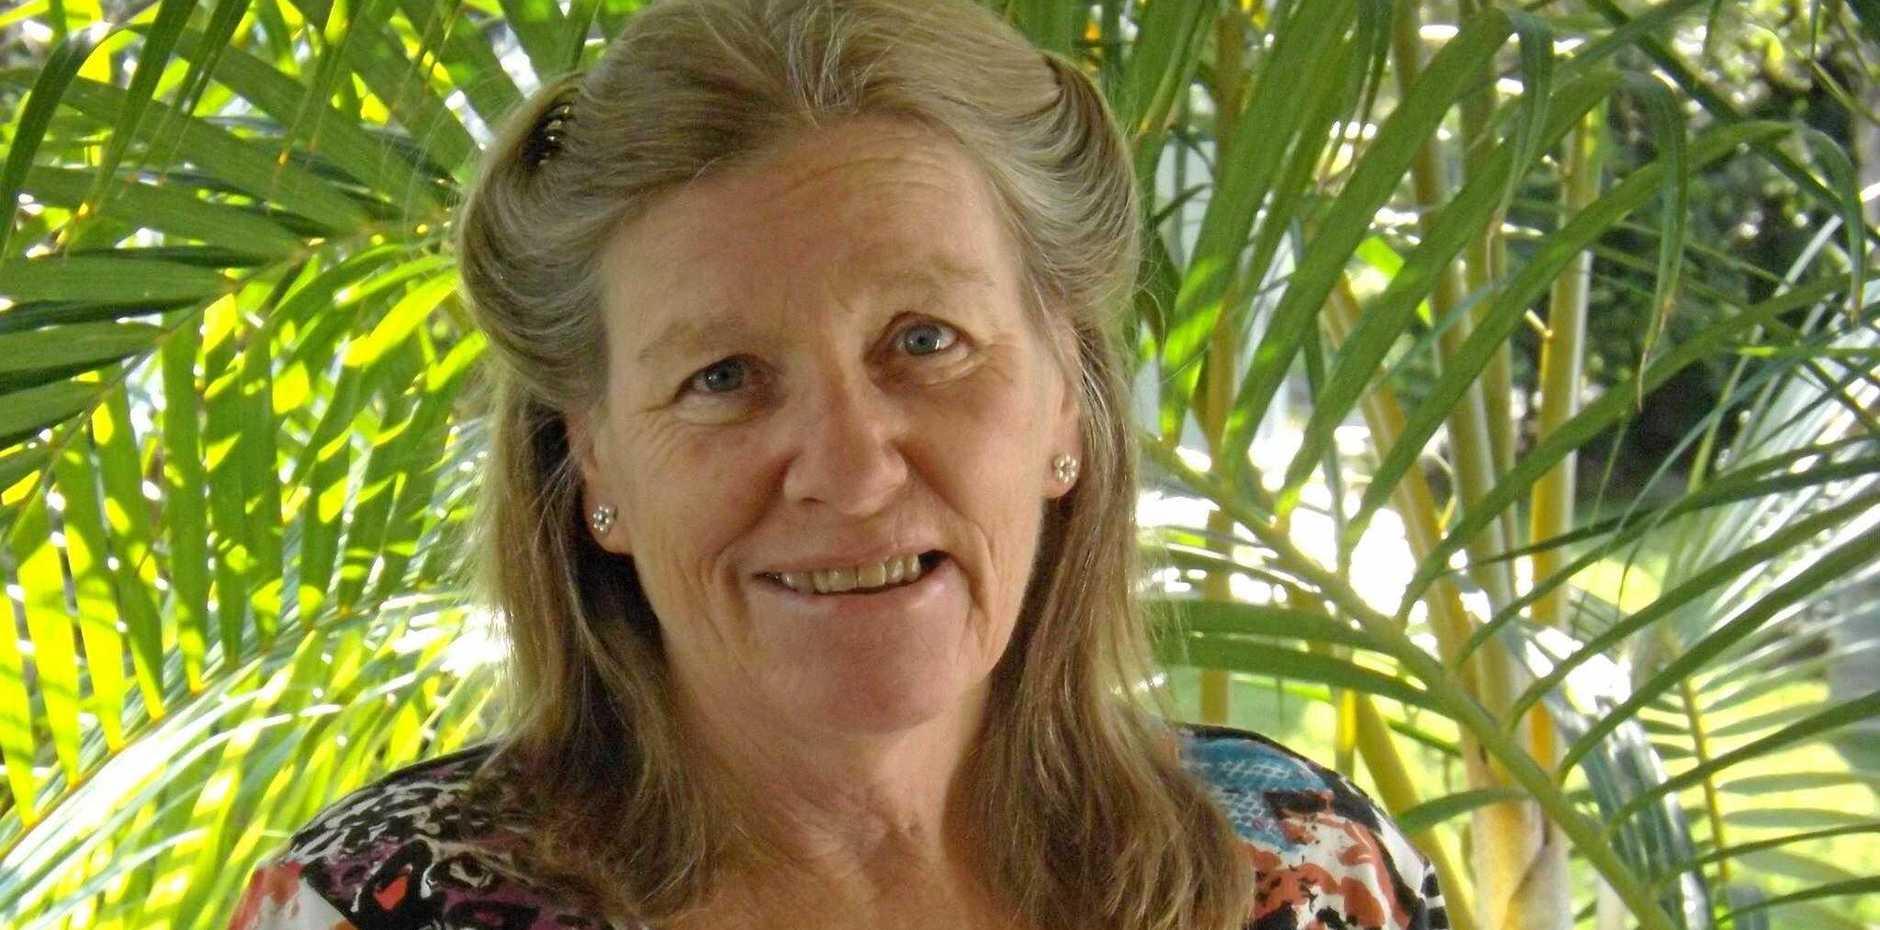 Suncare volunteer Sally Dickinson